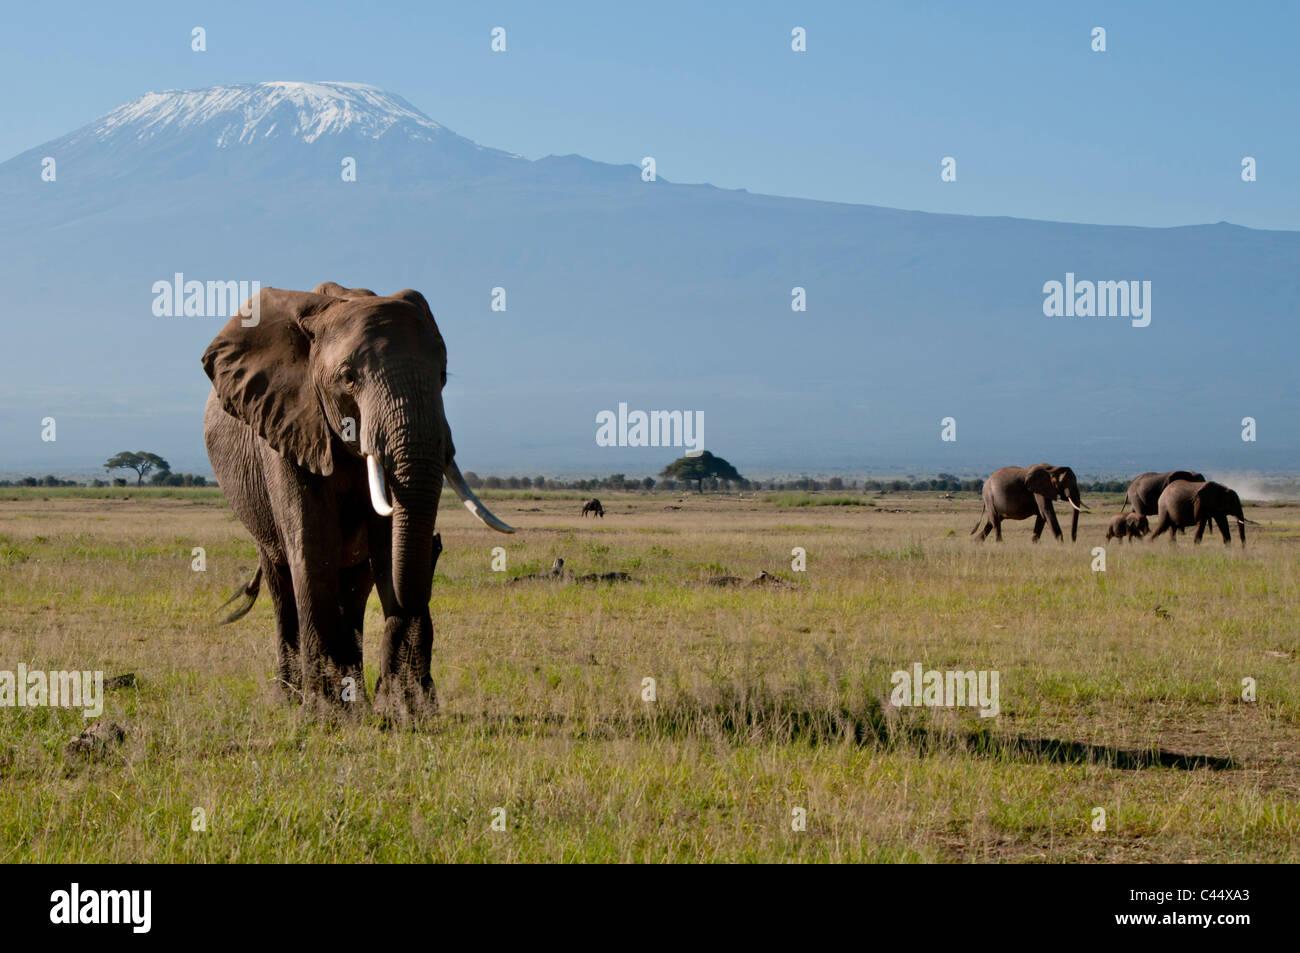 East Africa, Kenya, Kilimanjaro, Amboseli, solitary, bull, elephant, wildlife, game reserve, park, tourism, attraction, - Stock Image